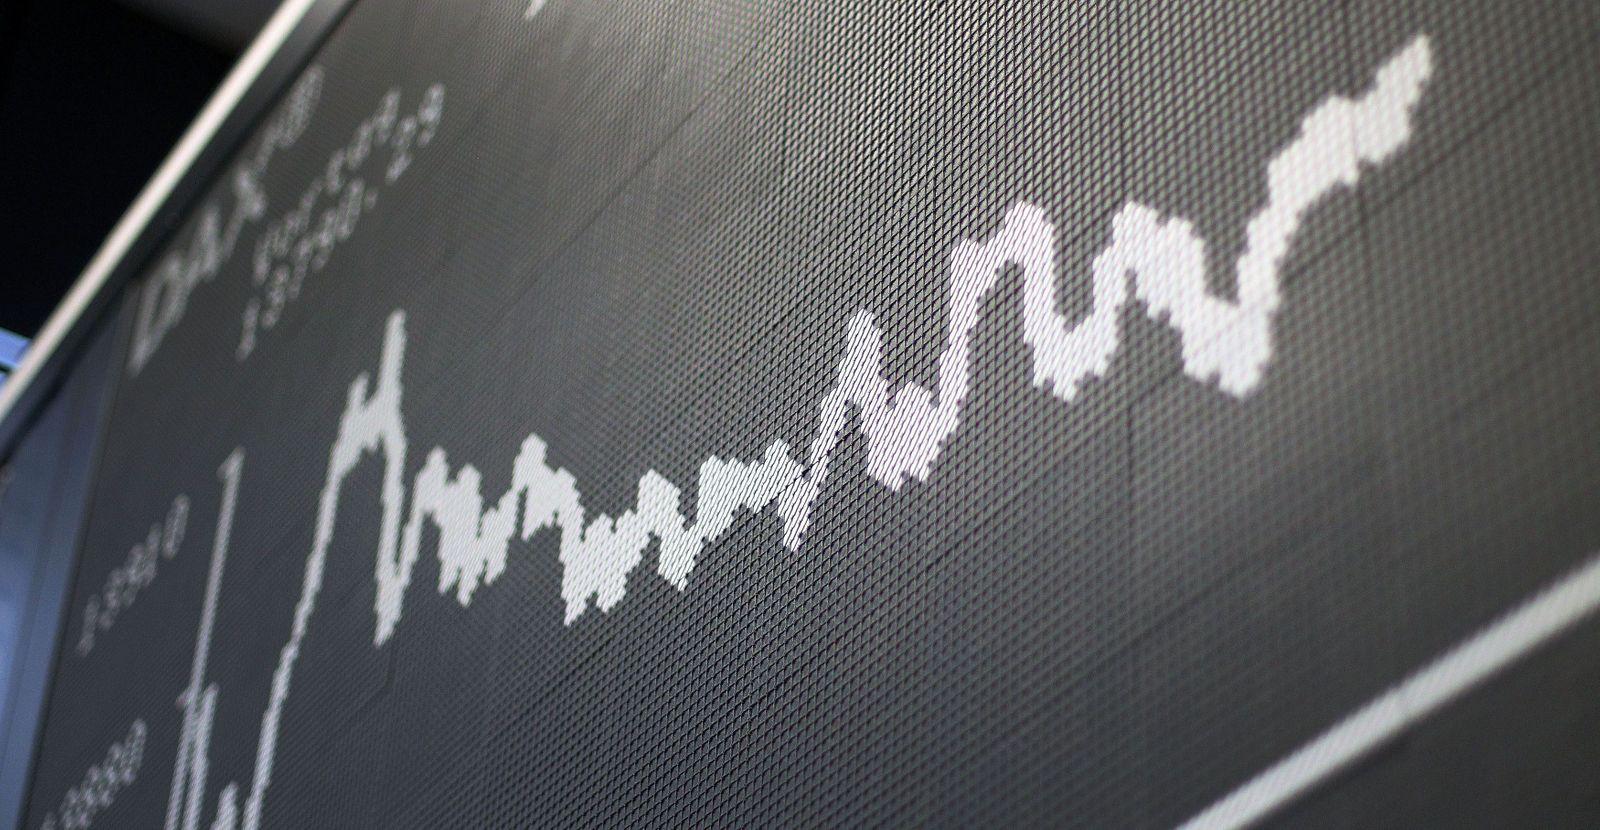 GERMANY-FINANCE-STOCK-MARKET-DAX